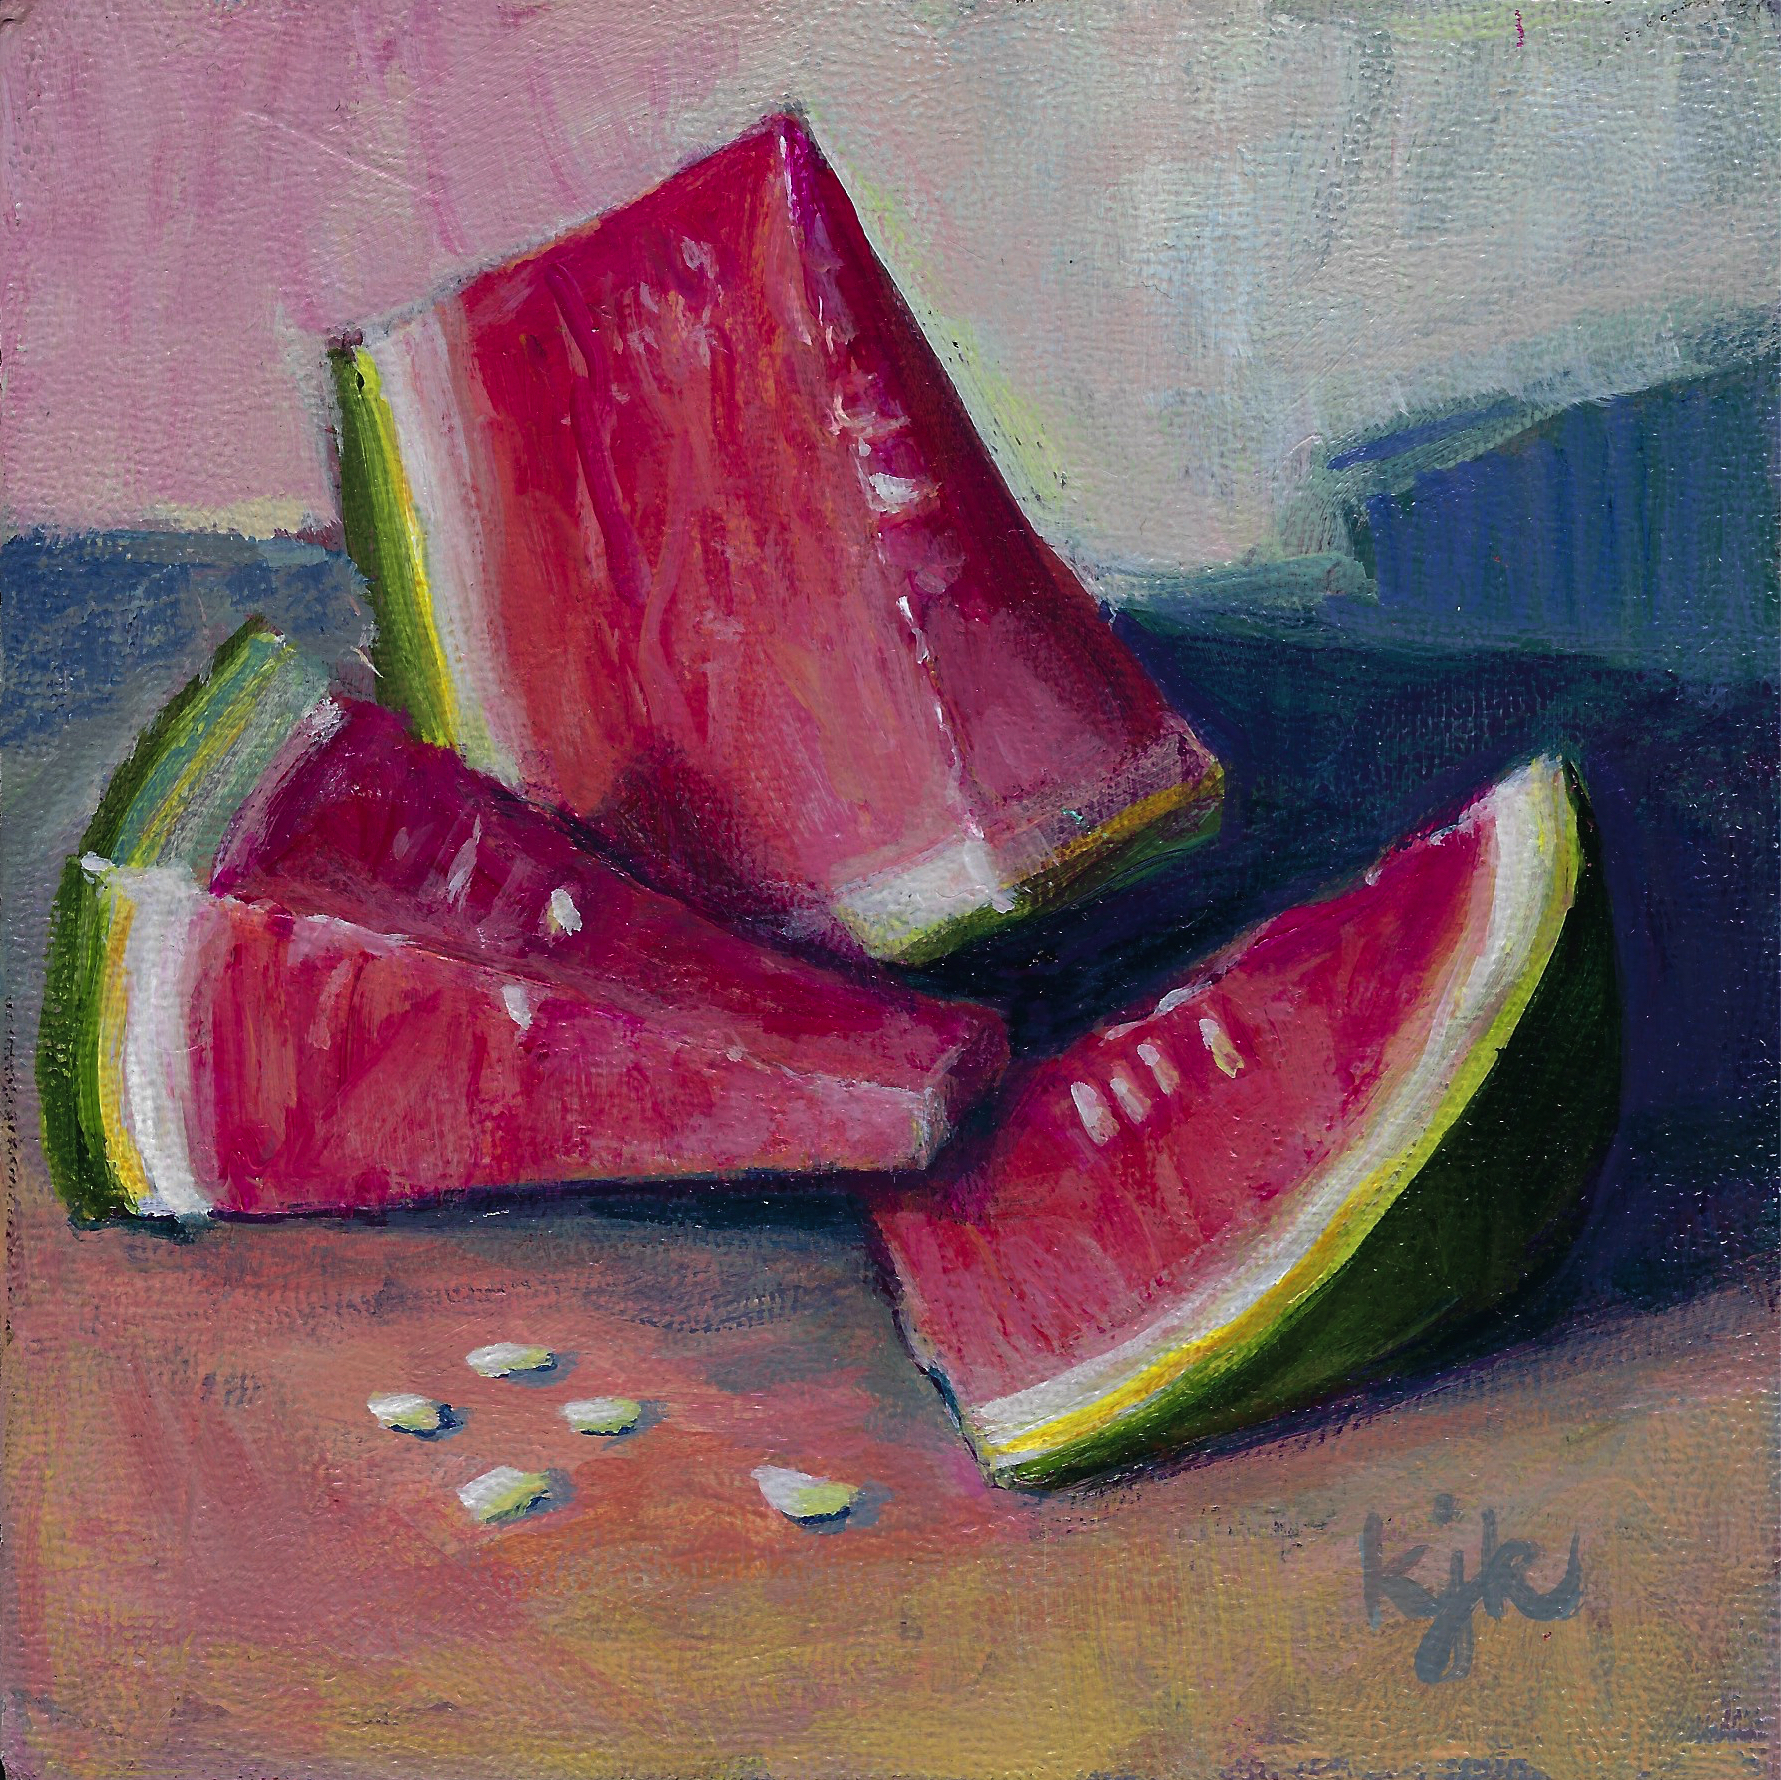 Watermelon Monoliths